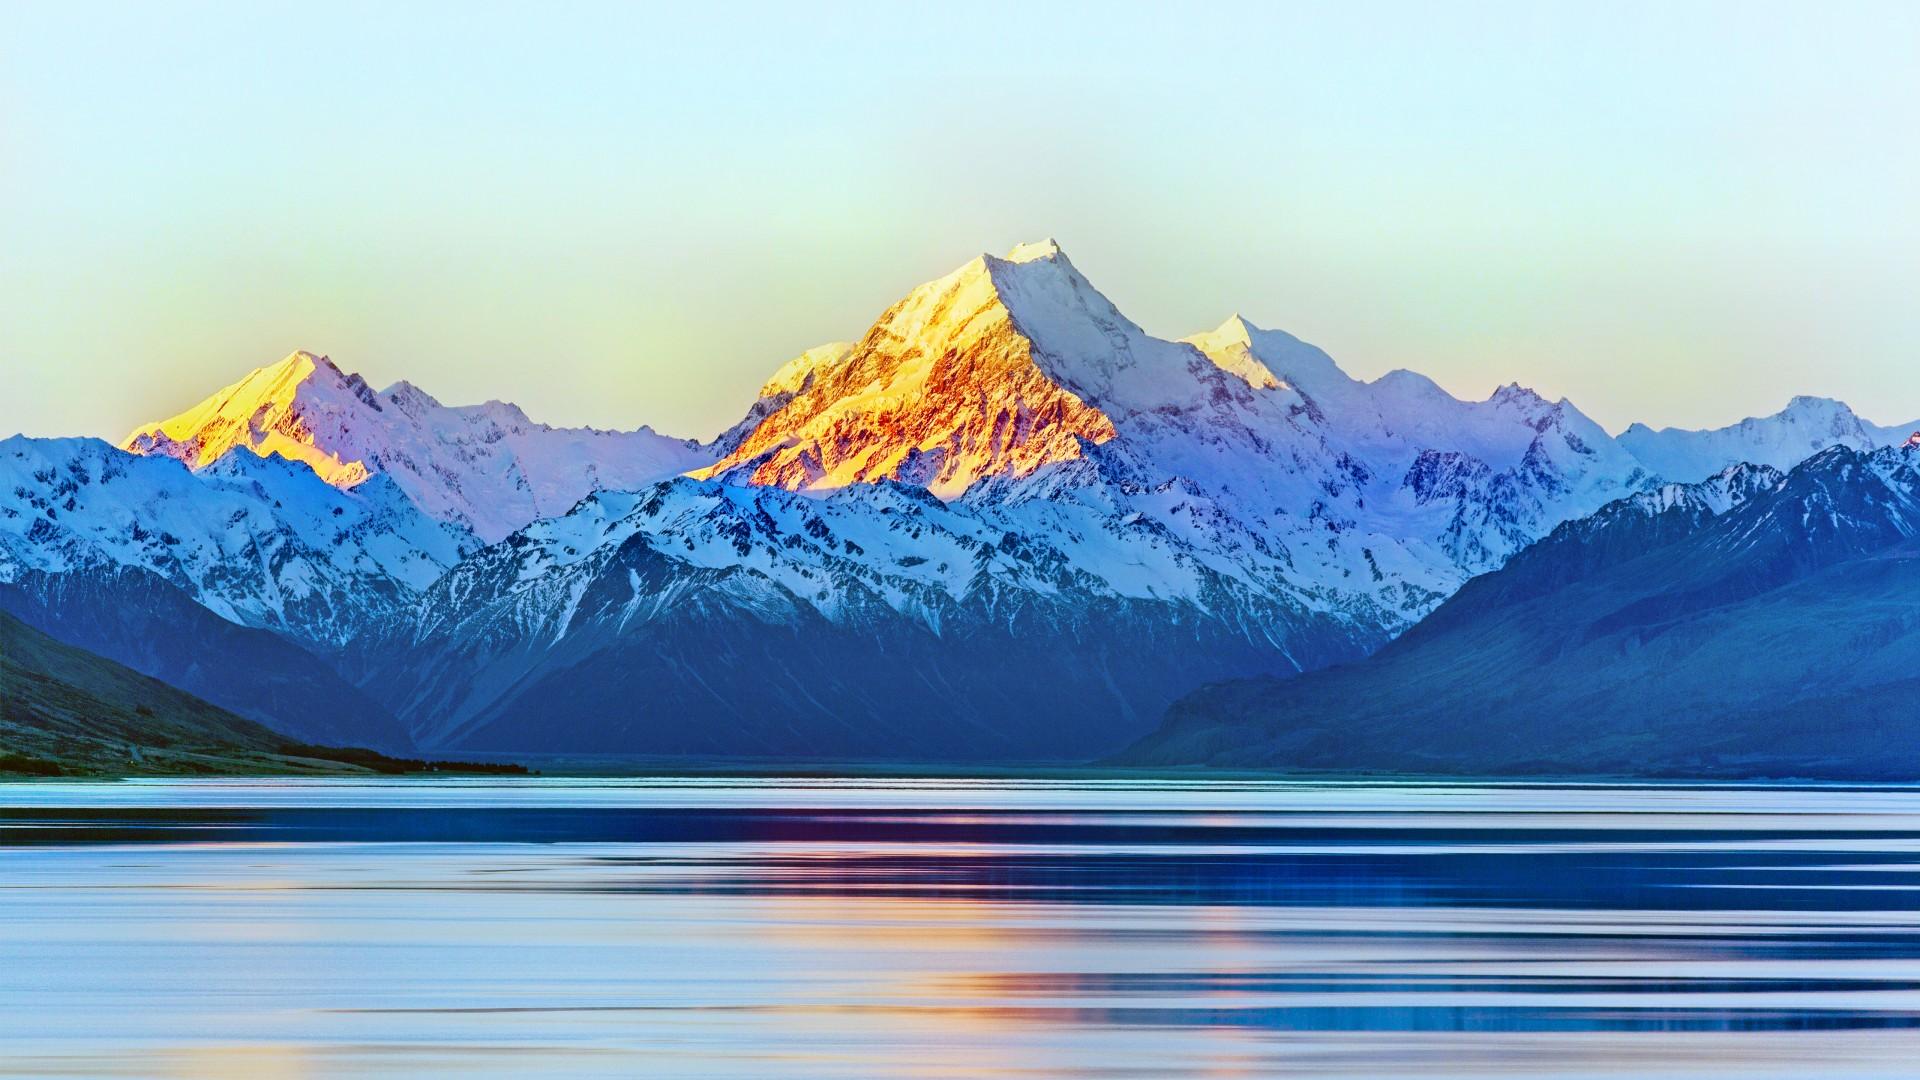 3d Scenery Wallpaper For Desktop Aoraki Mount Cook New Zealand 5k Wallpapers Hd